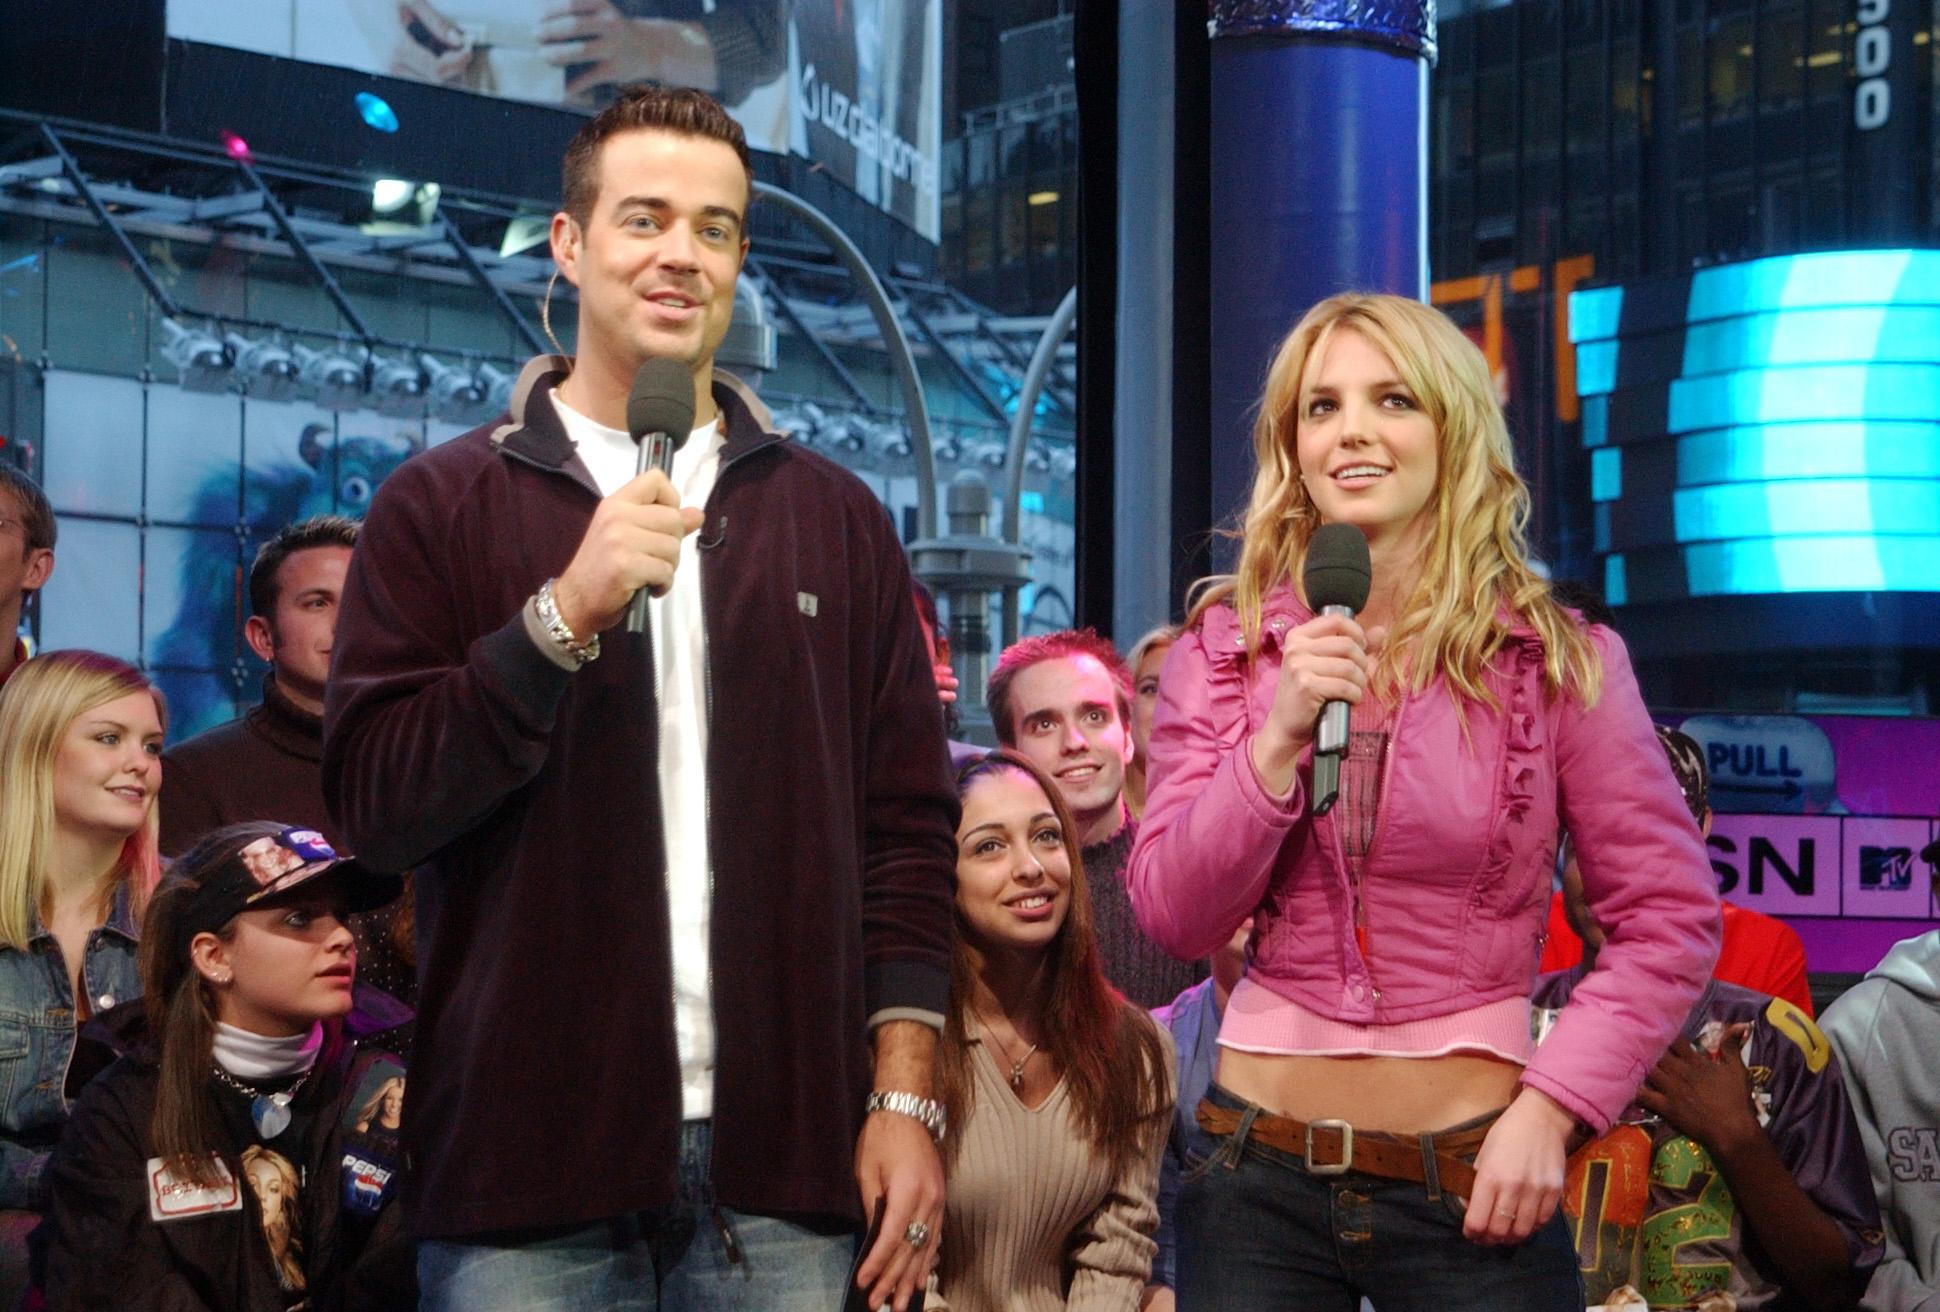 Carson Daly & Britney Spears on TRL in New York City, Nov. 6, 2001.